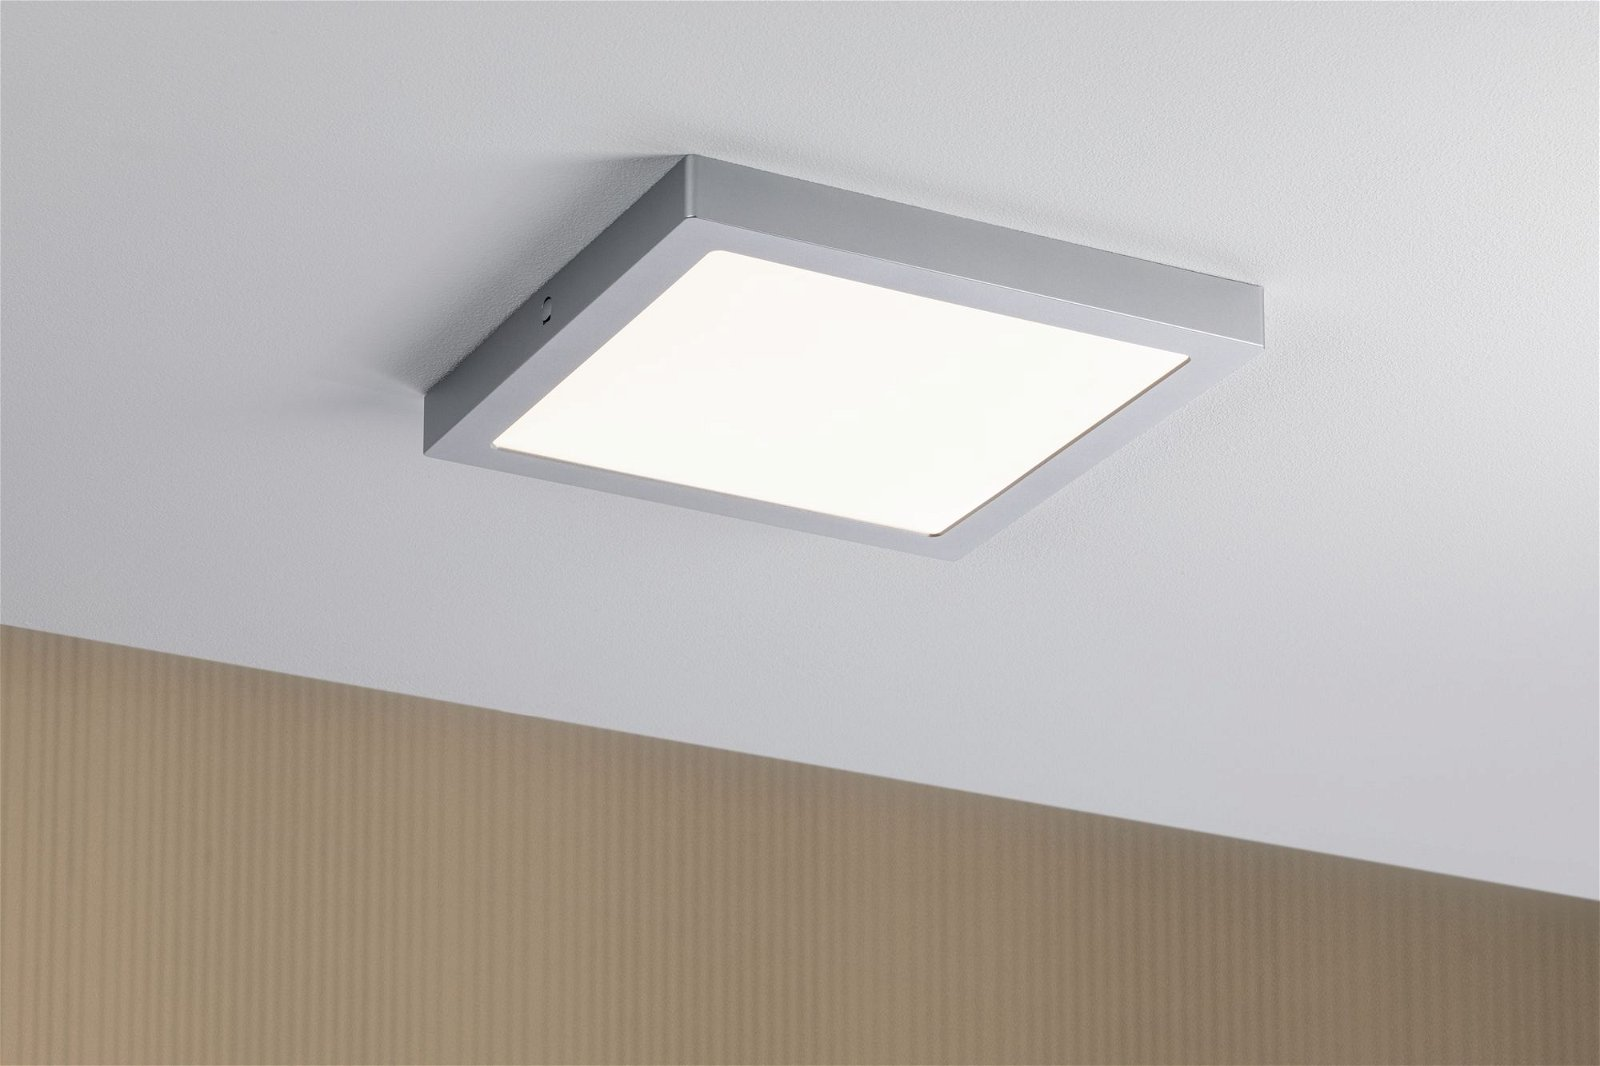 LED Panel Abia square 300x300mm 3200lm 2700K Chrome matt